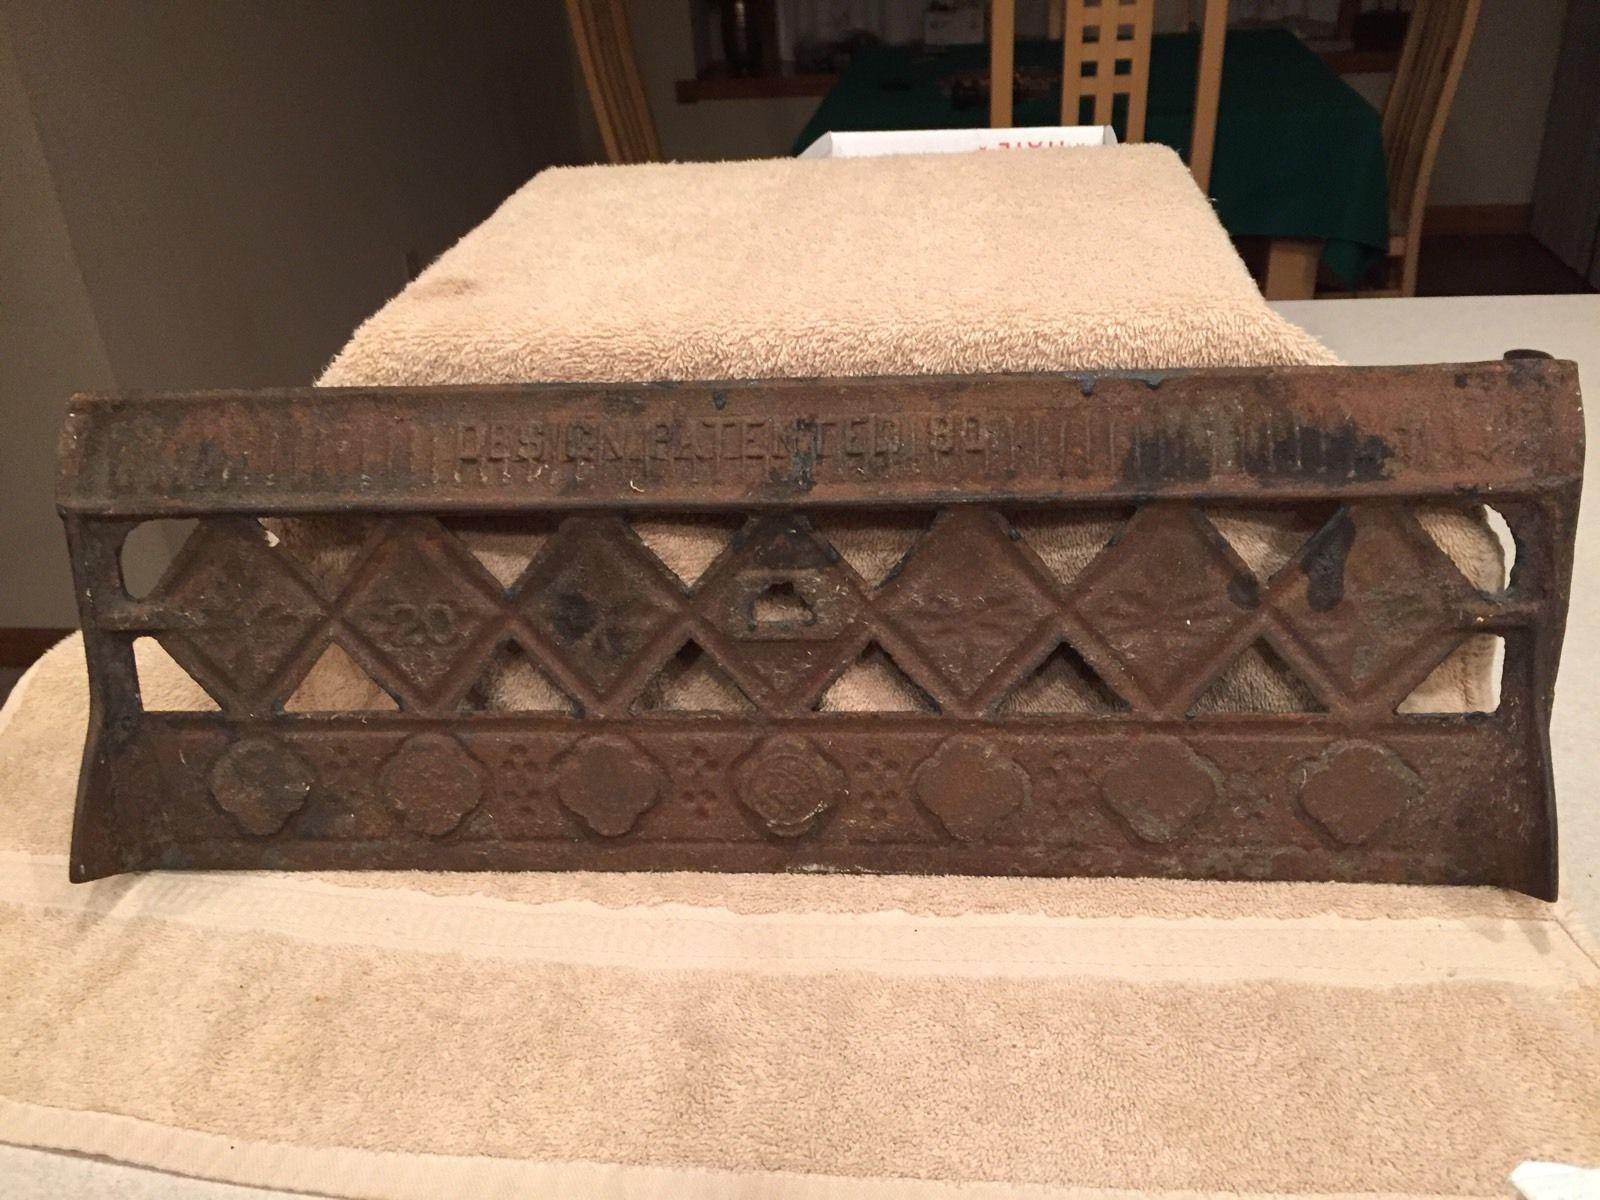 Decorative Grates Registers Victorian Cast Iron Floor Grille 38x19 Heat Grate Register Very